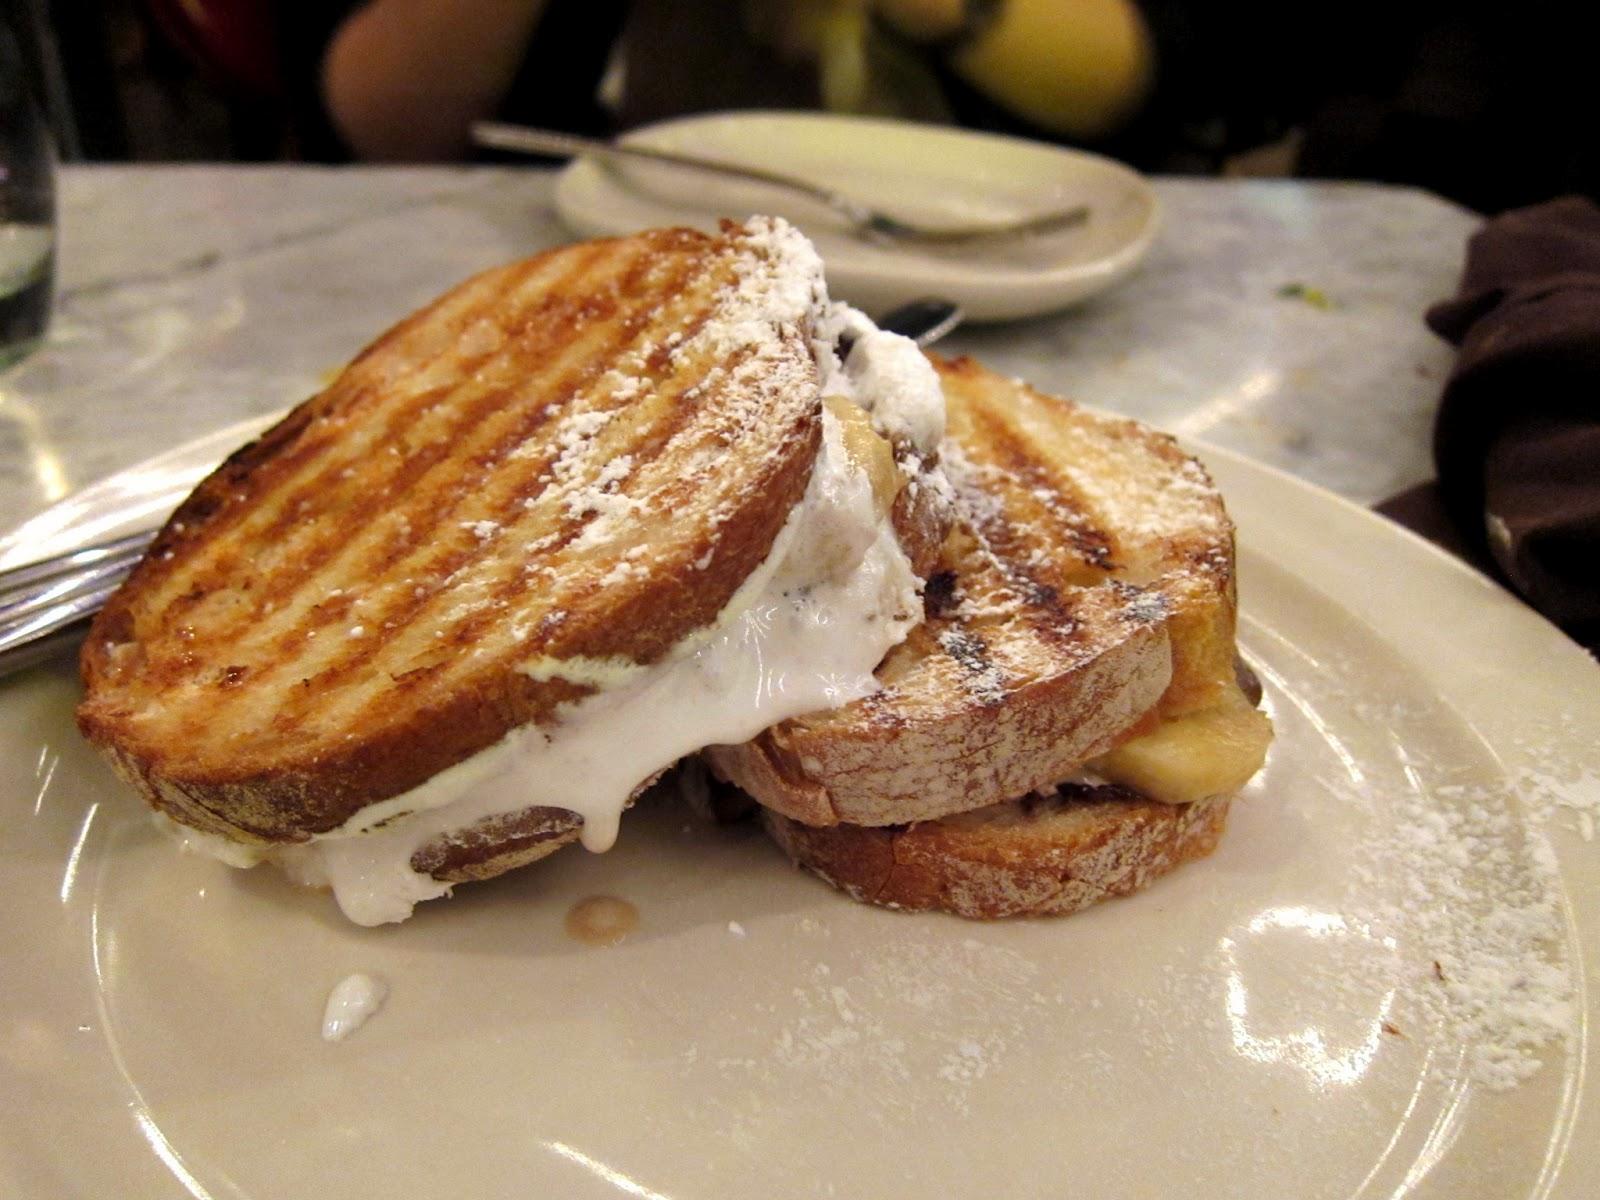 Panino con Nutella c hocolate hazelnut s pread, marshmallow cream ...